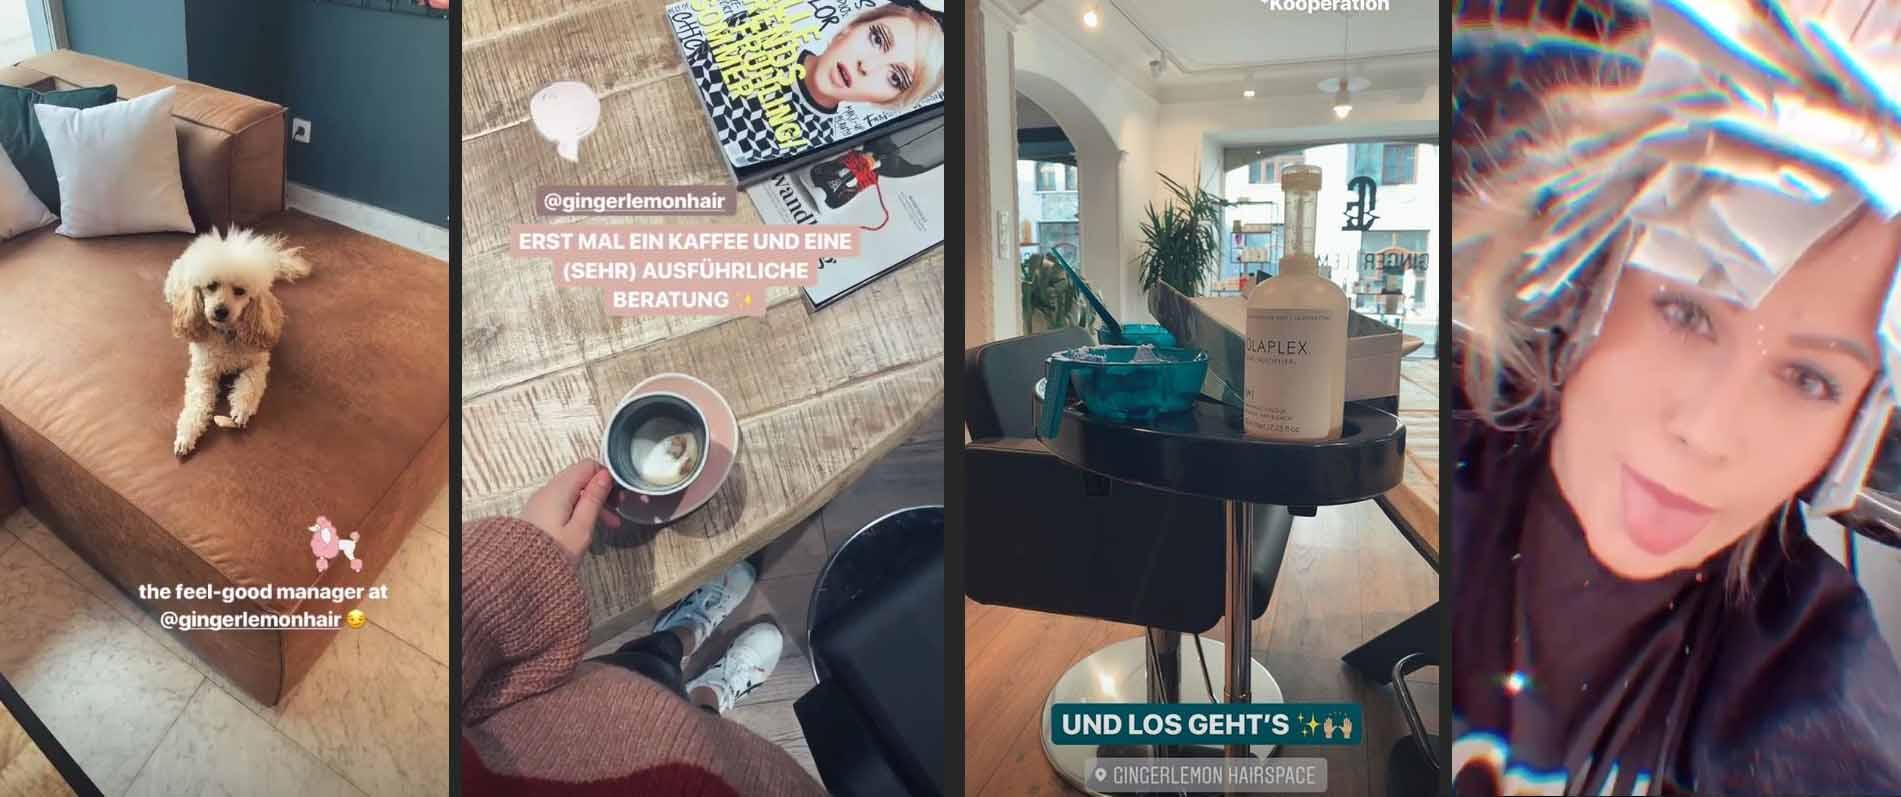 1 blogger+influencer+vienna+friseur+wien+hairdresser+ginger+lemon+gingerlemon+hairspace+antonia+mutausbrueche+interior+vegan+bts.jpg